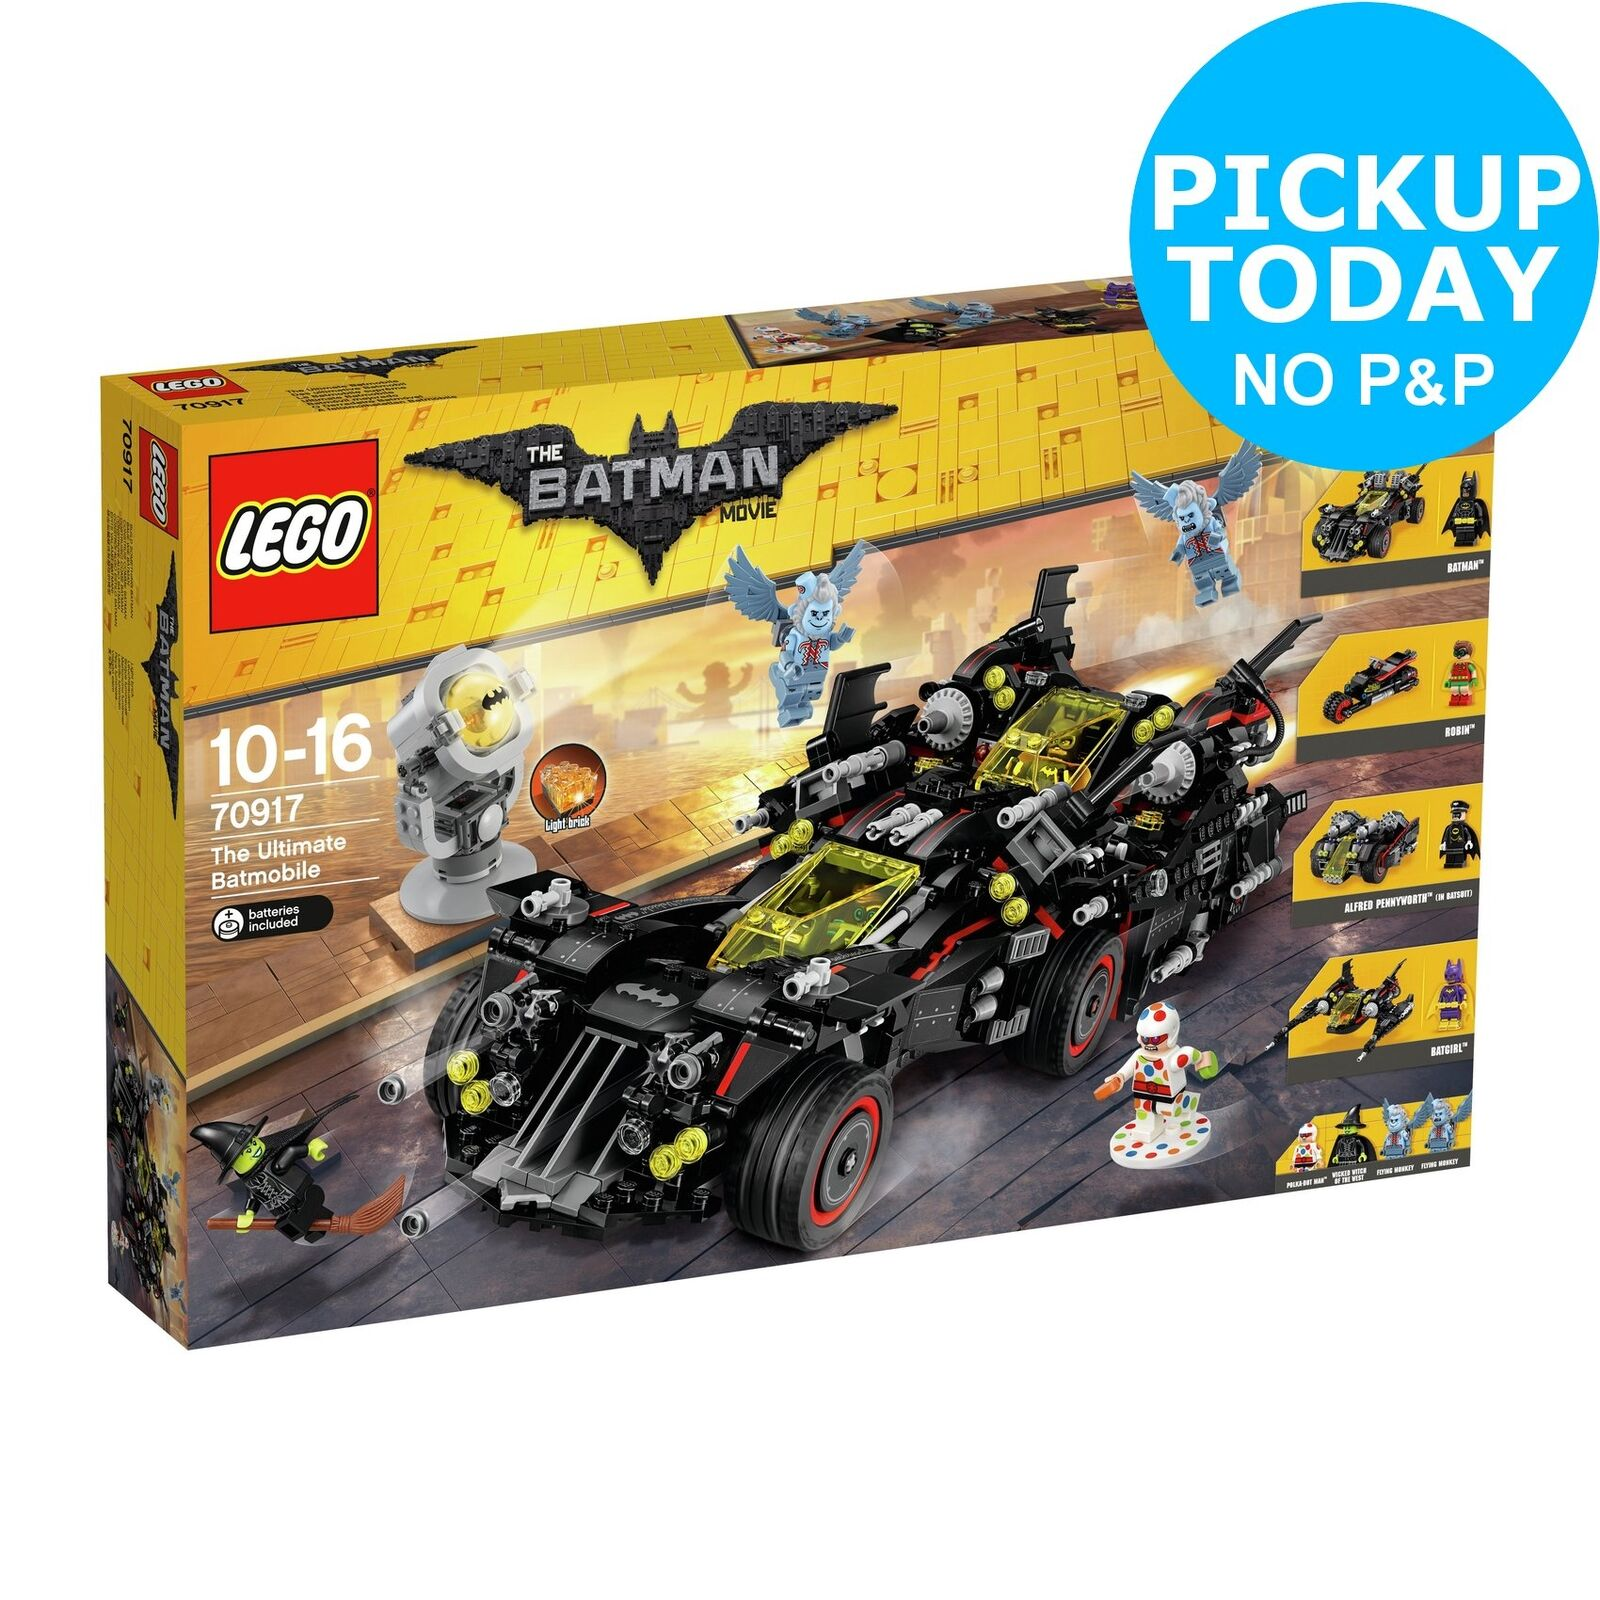 LEGO The Batman Movie Ultimate Batmobile Playset 10+ Years - 70917